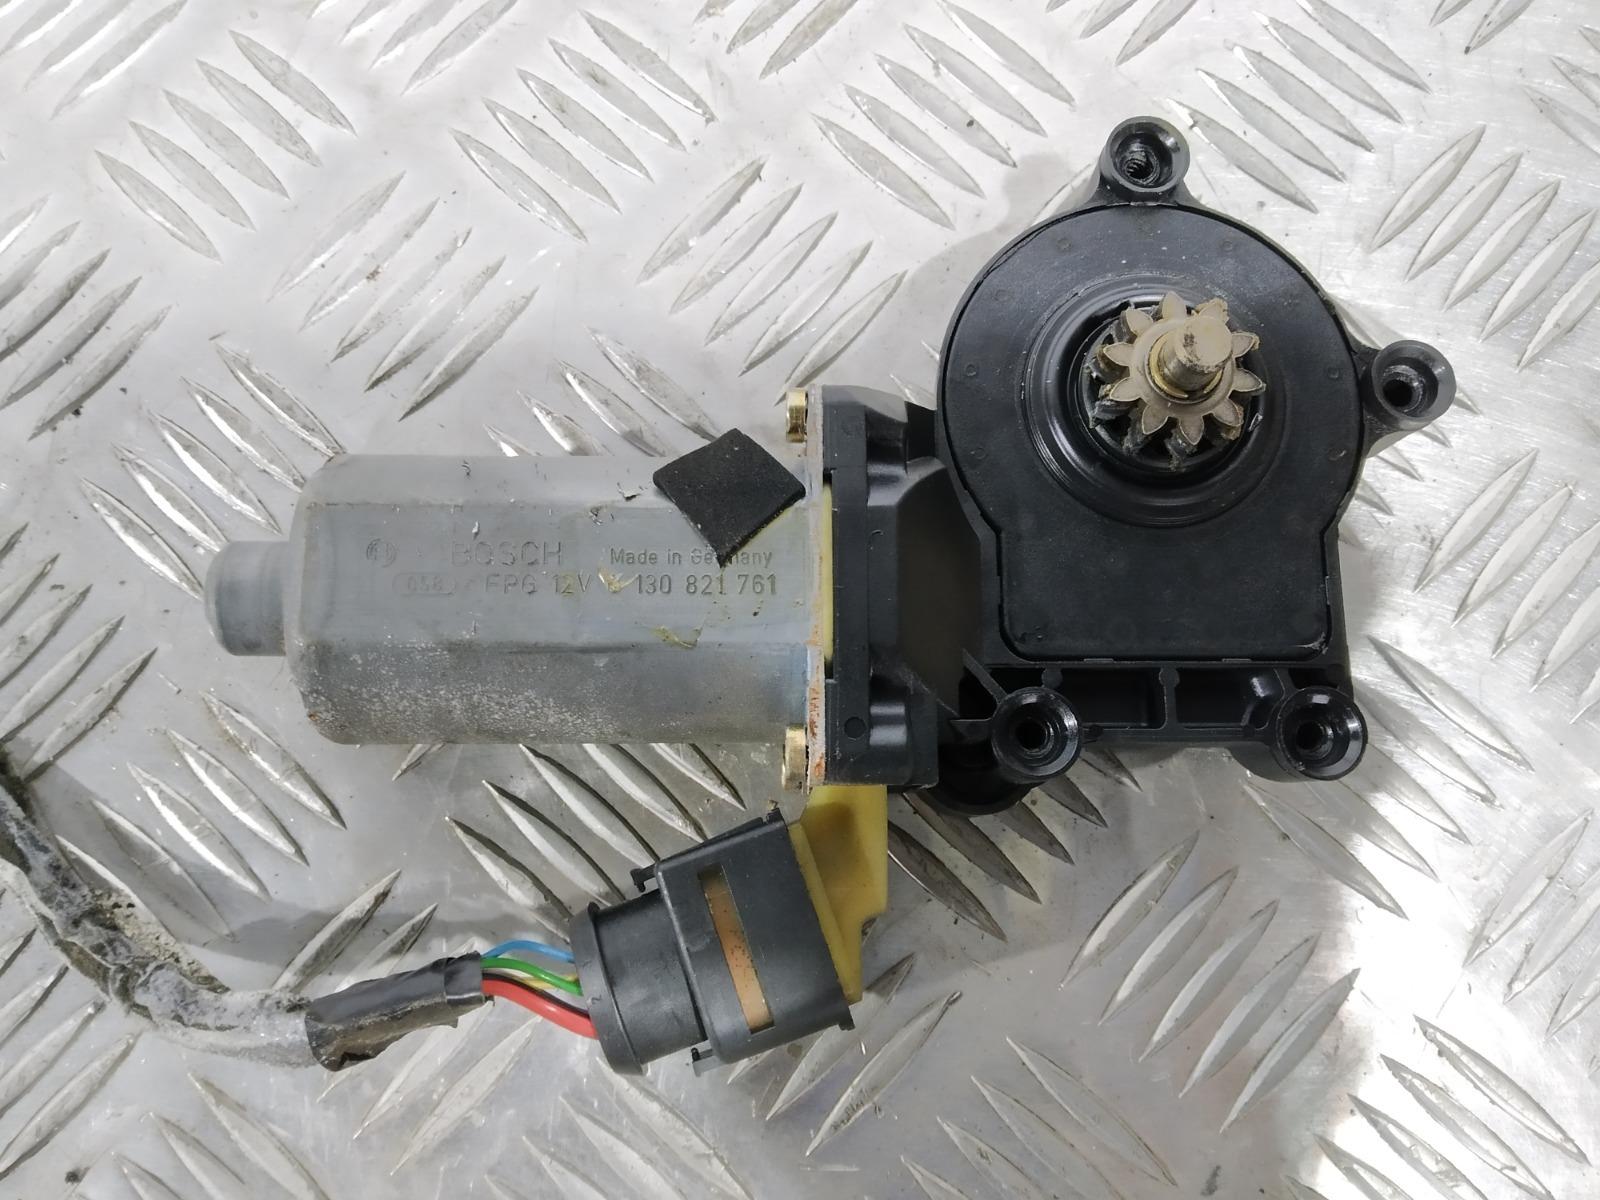 Моторчик стеклоподъемника передний правый Volvo S80 2.4 I 2000 (б/у)